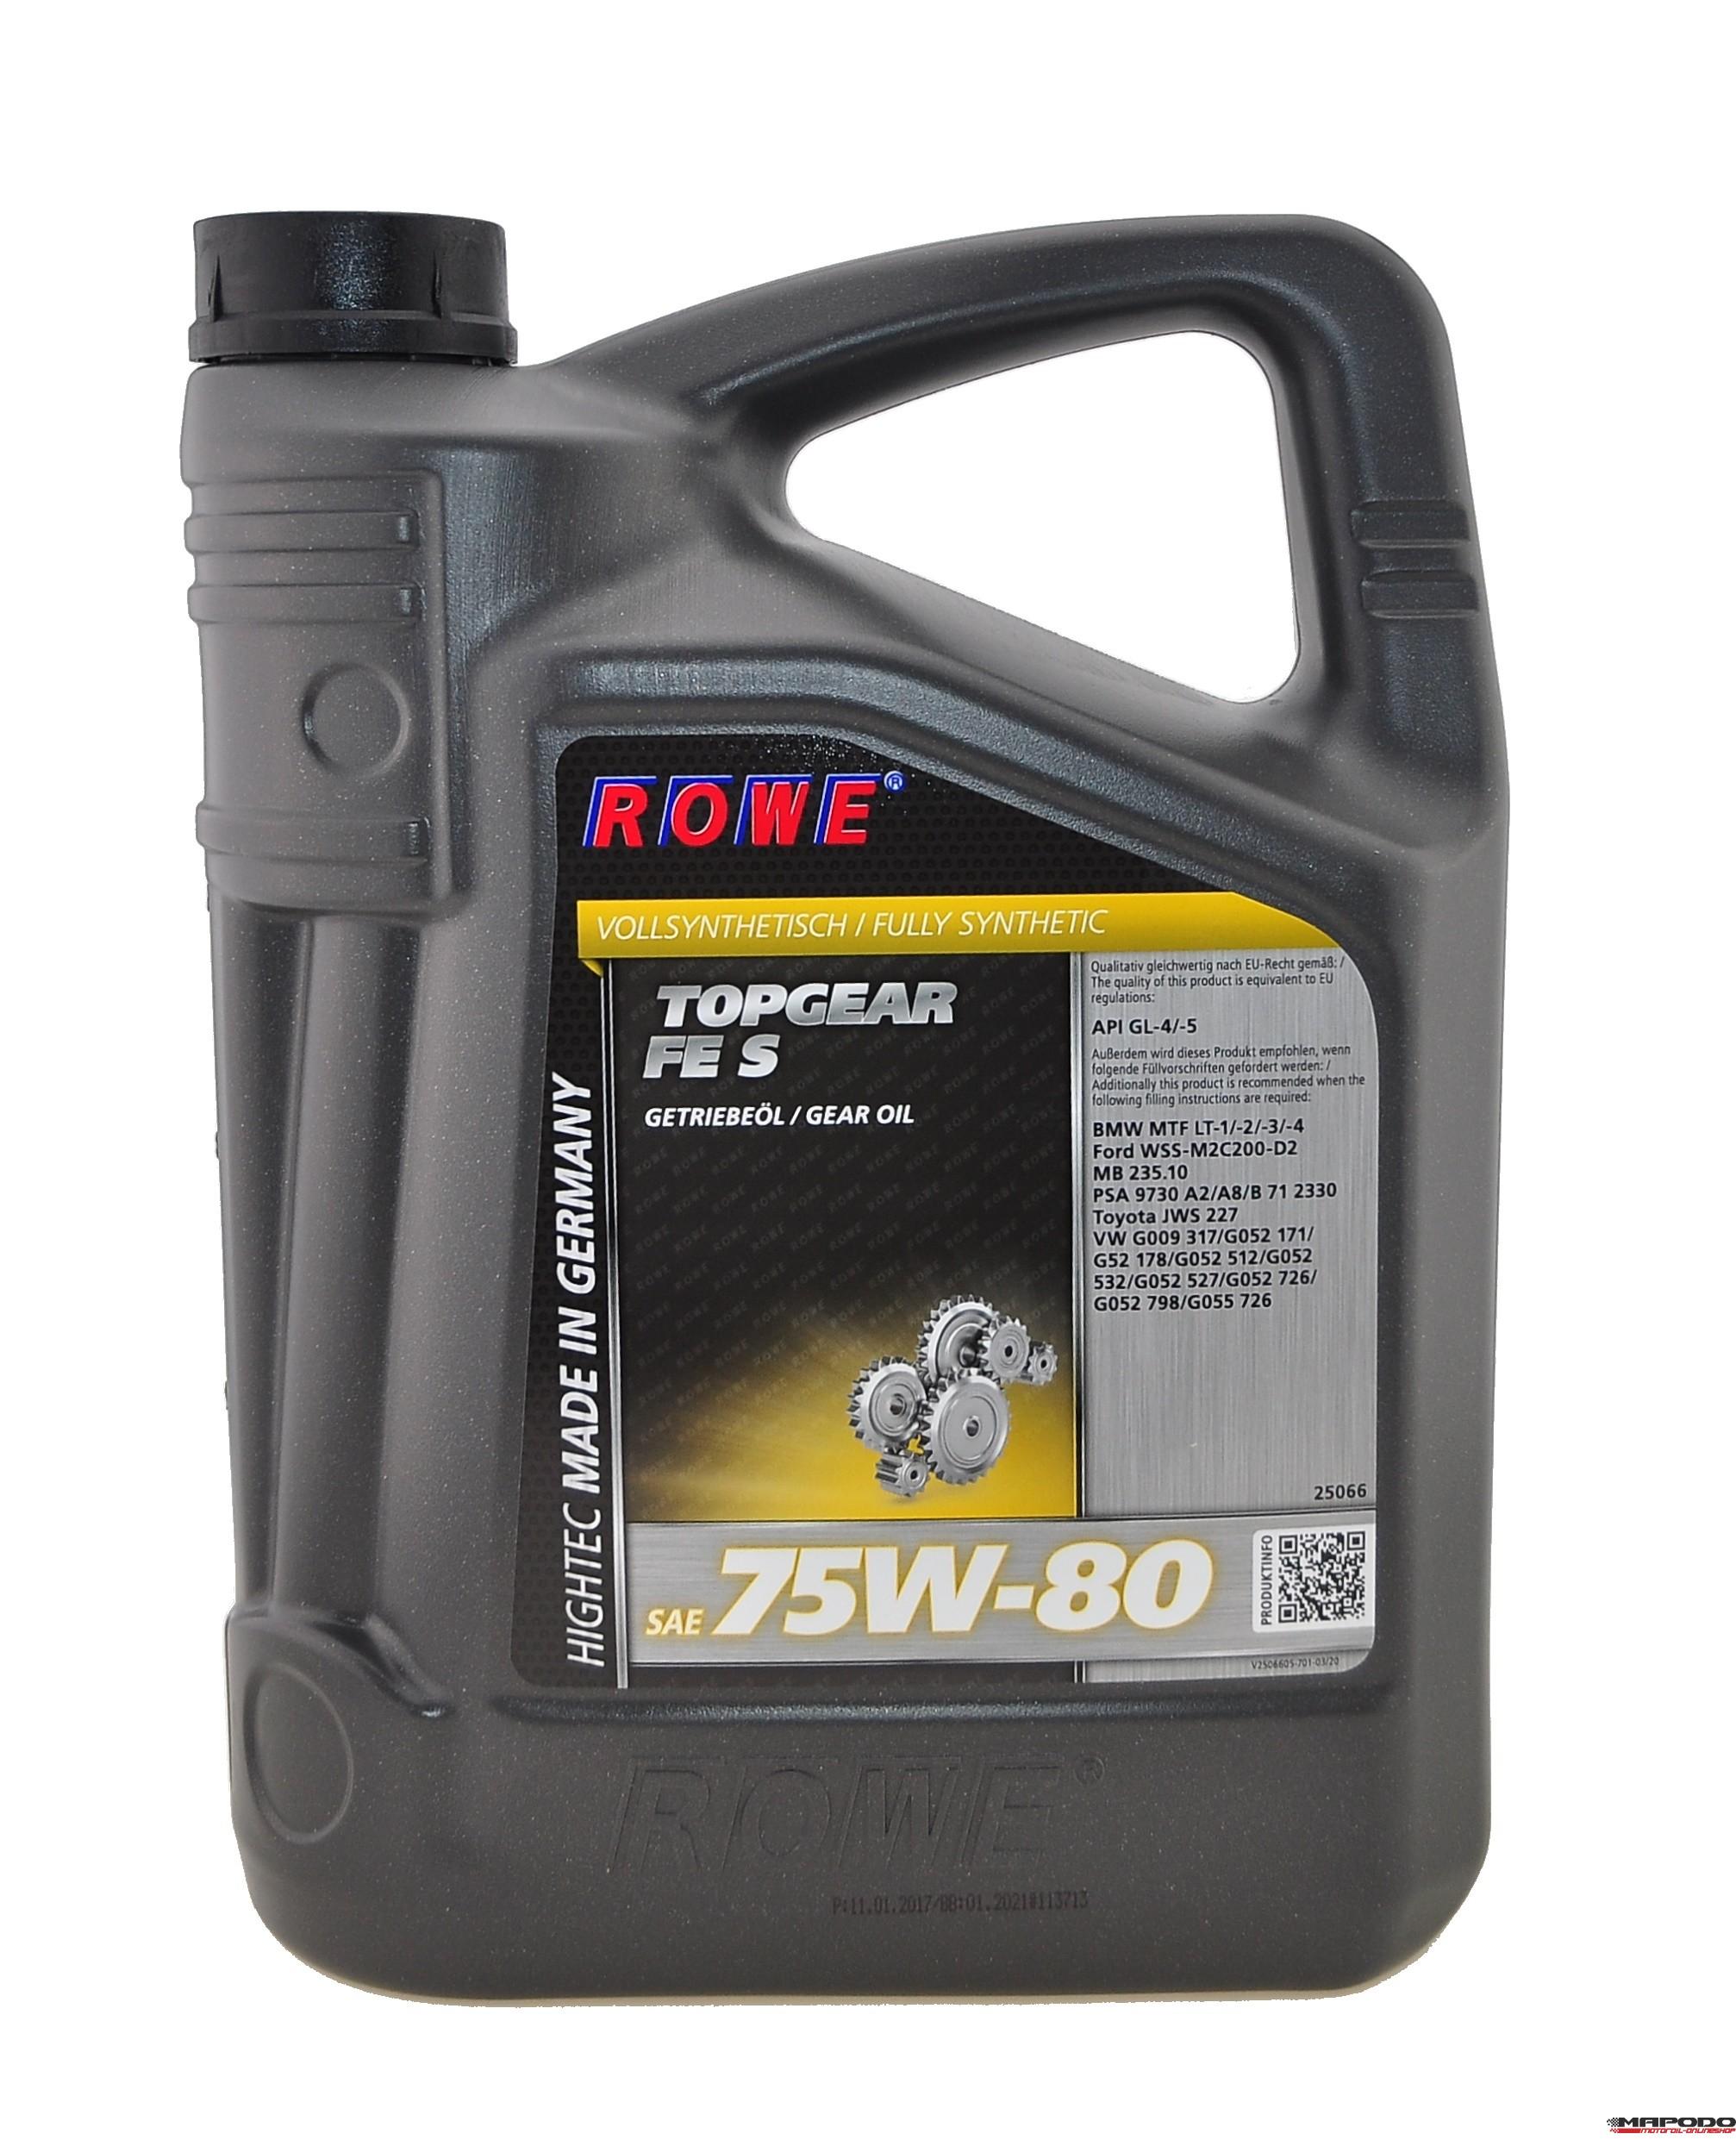 Rowe Hightec Topgear FE SAE 75W-80 S 5 Liter